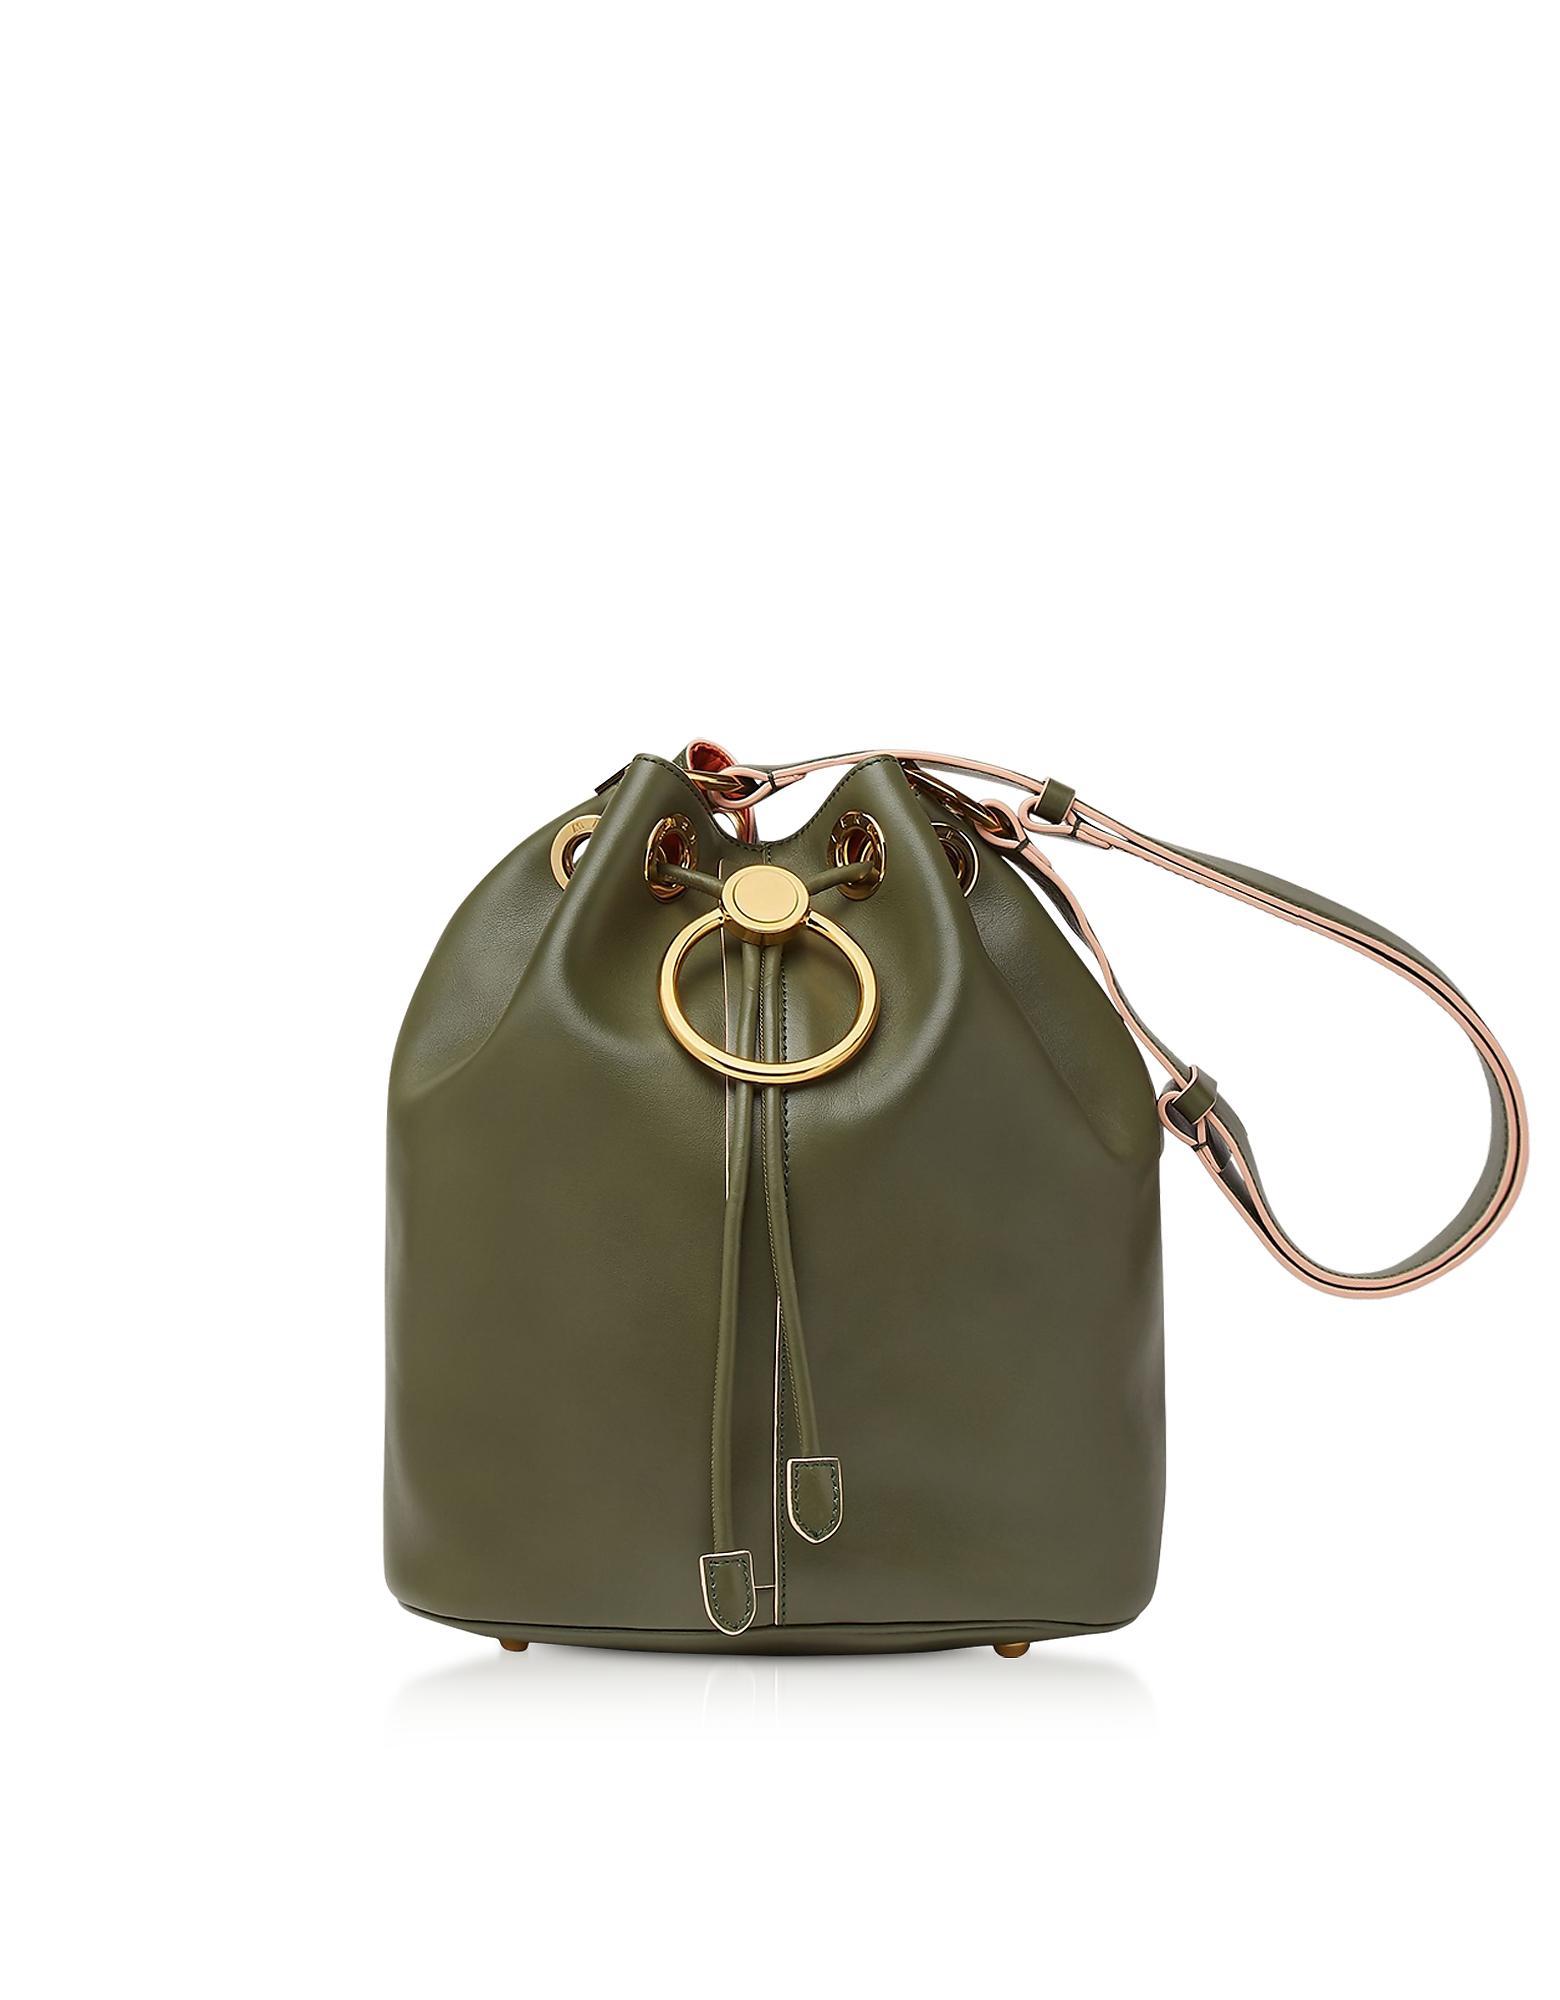 Marni Designer Handbags, Earring Leather Drawstring Bucket bag